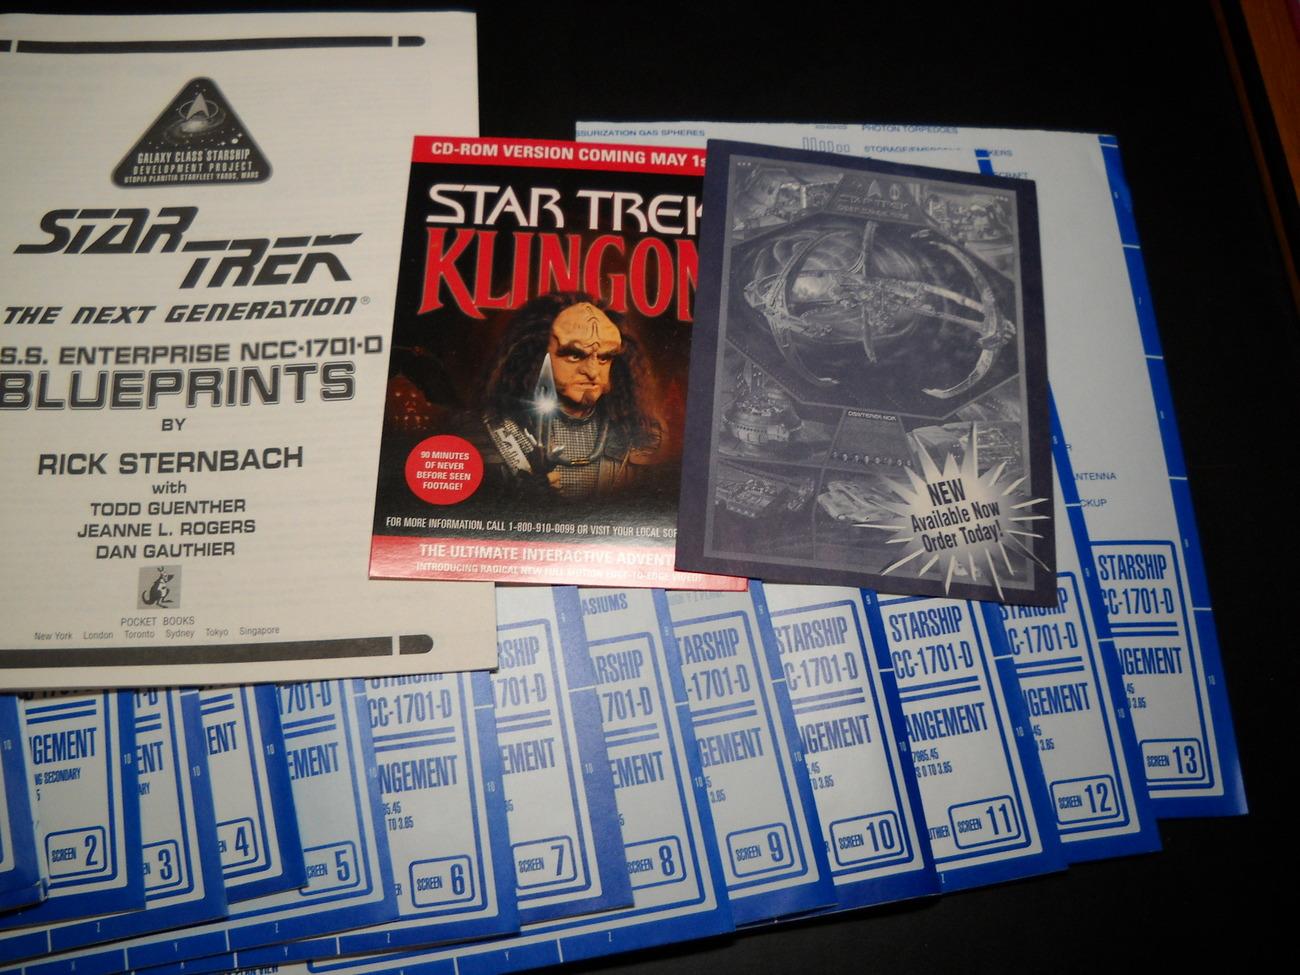 Star Trek Next Generation USS Enterprise NCC 1701 D Blueprints 13 in Book Box